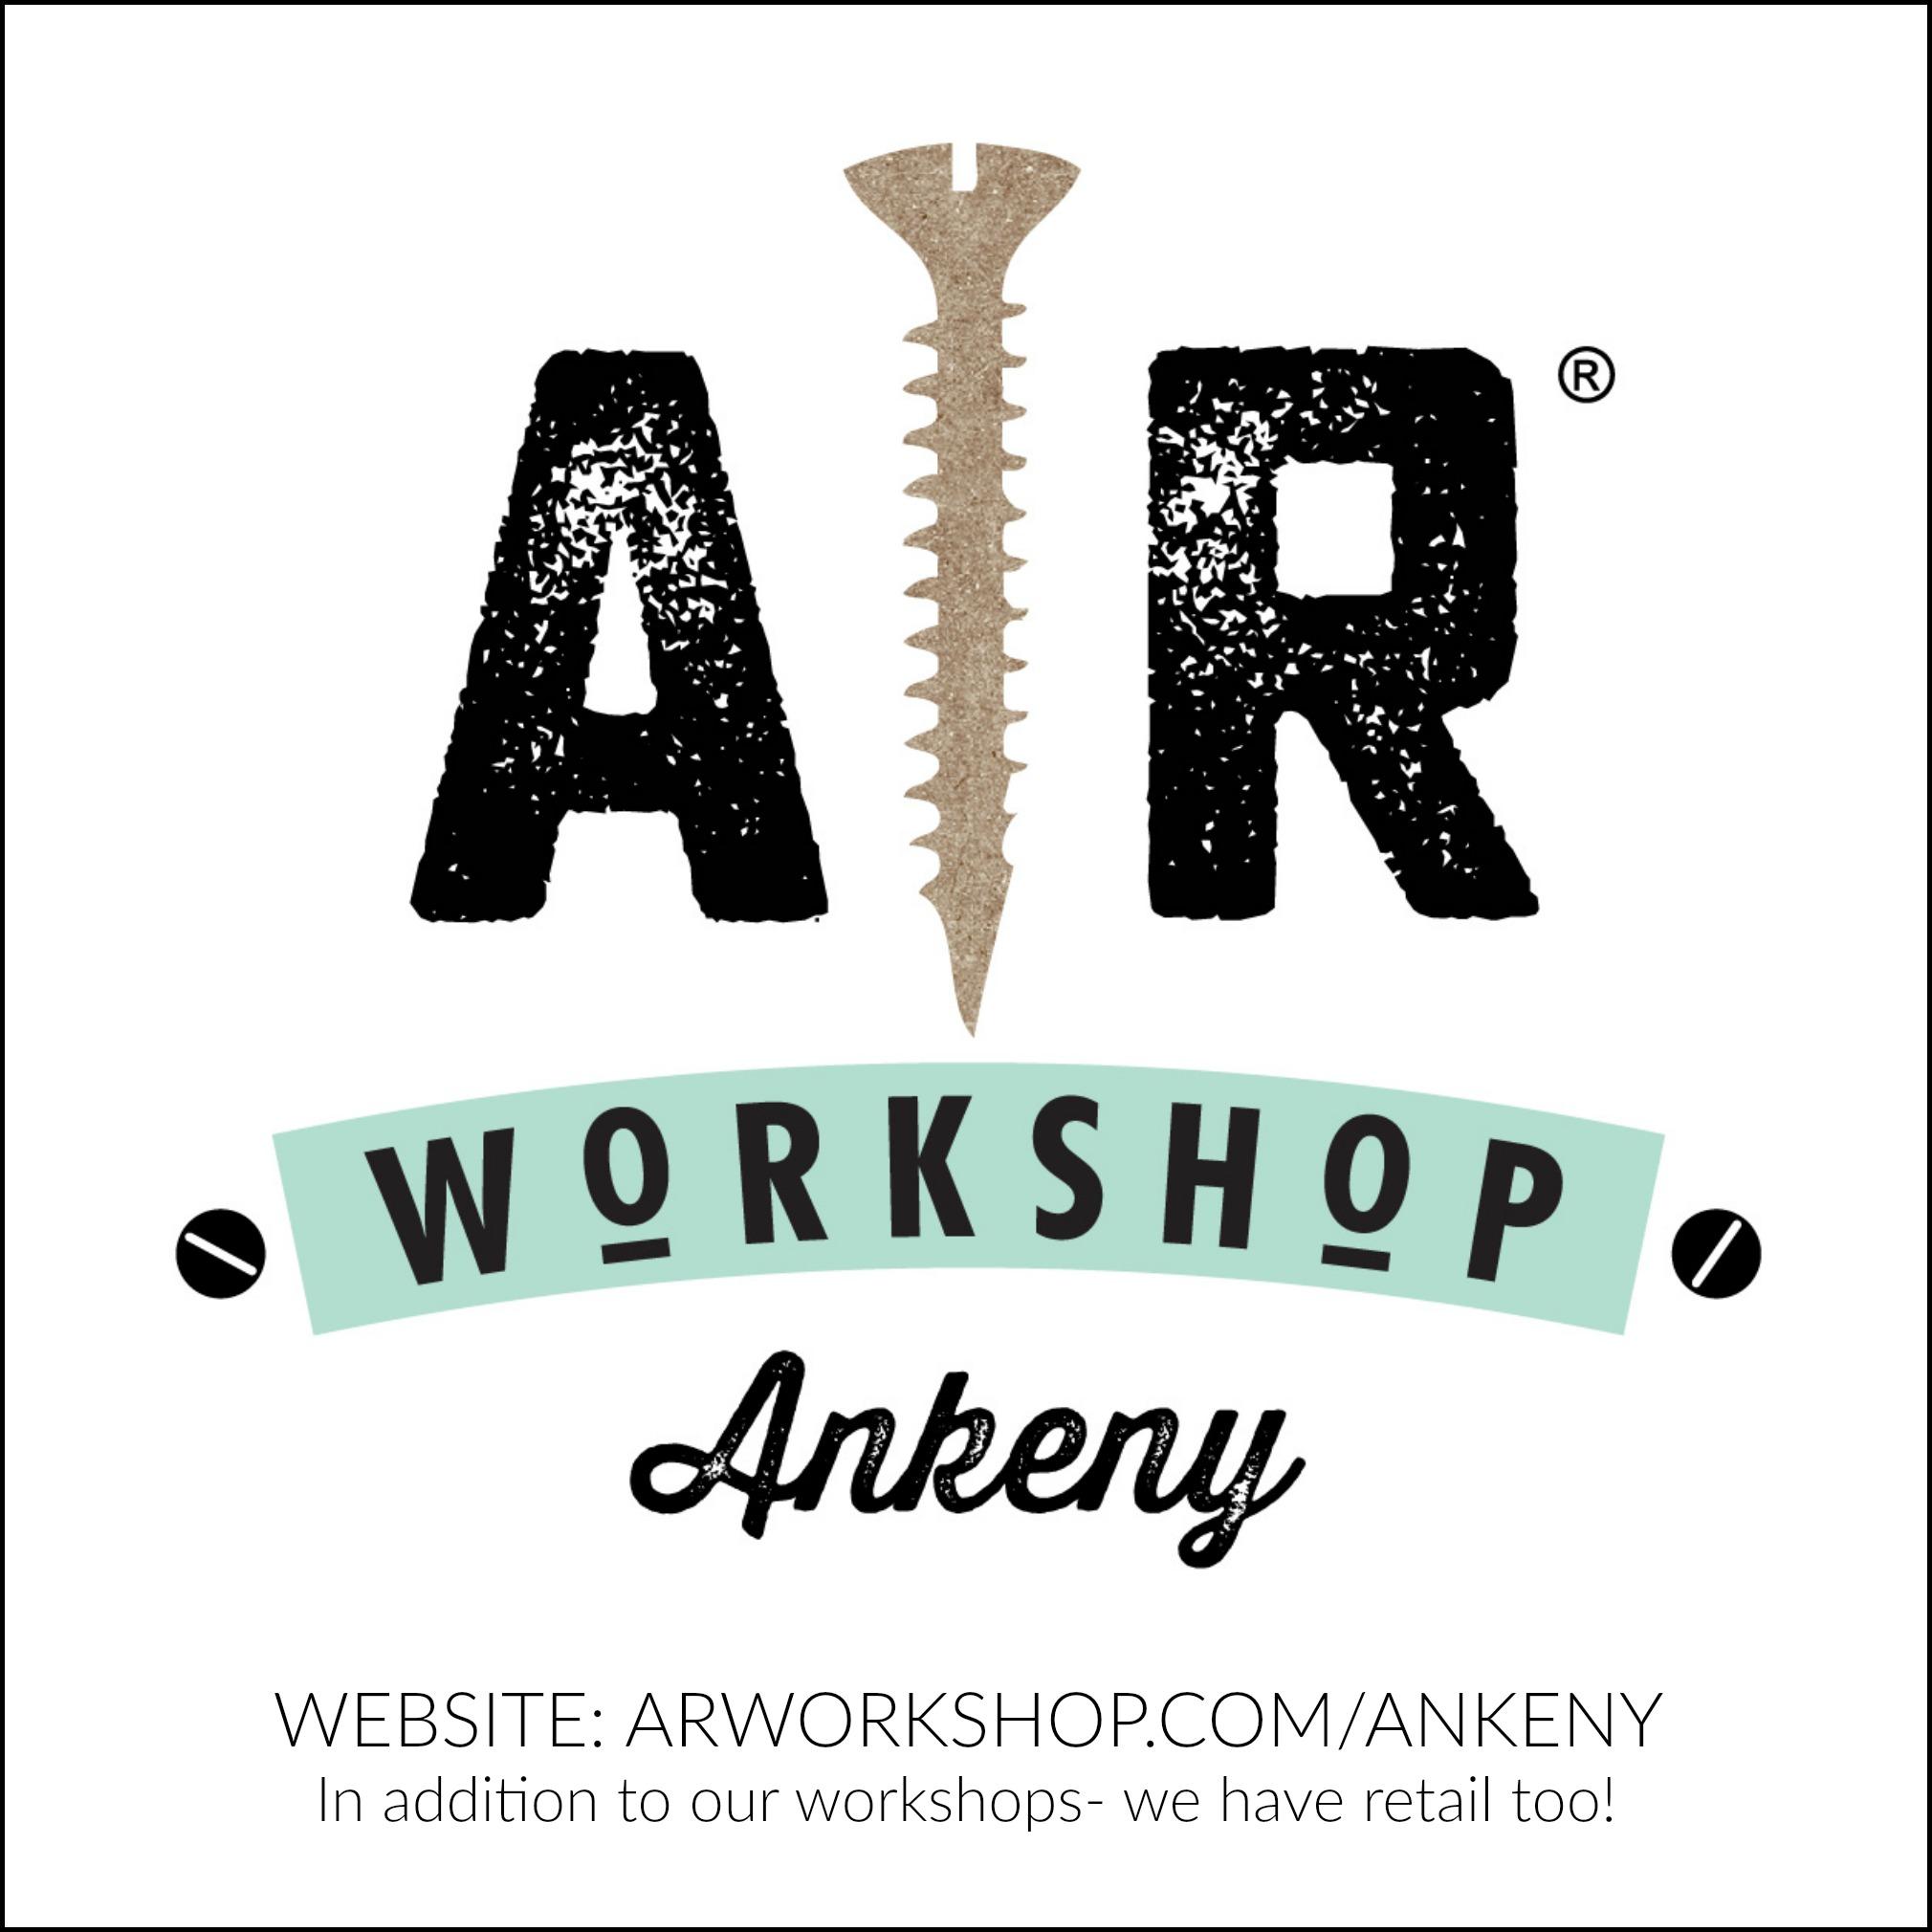 AR Workshop Ankeny | arworkshop.com/ankeny